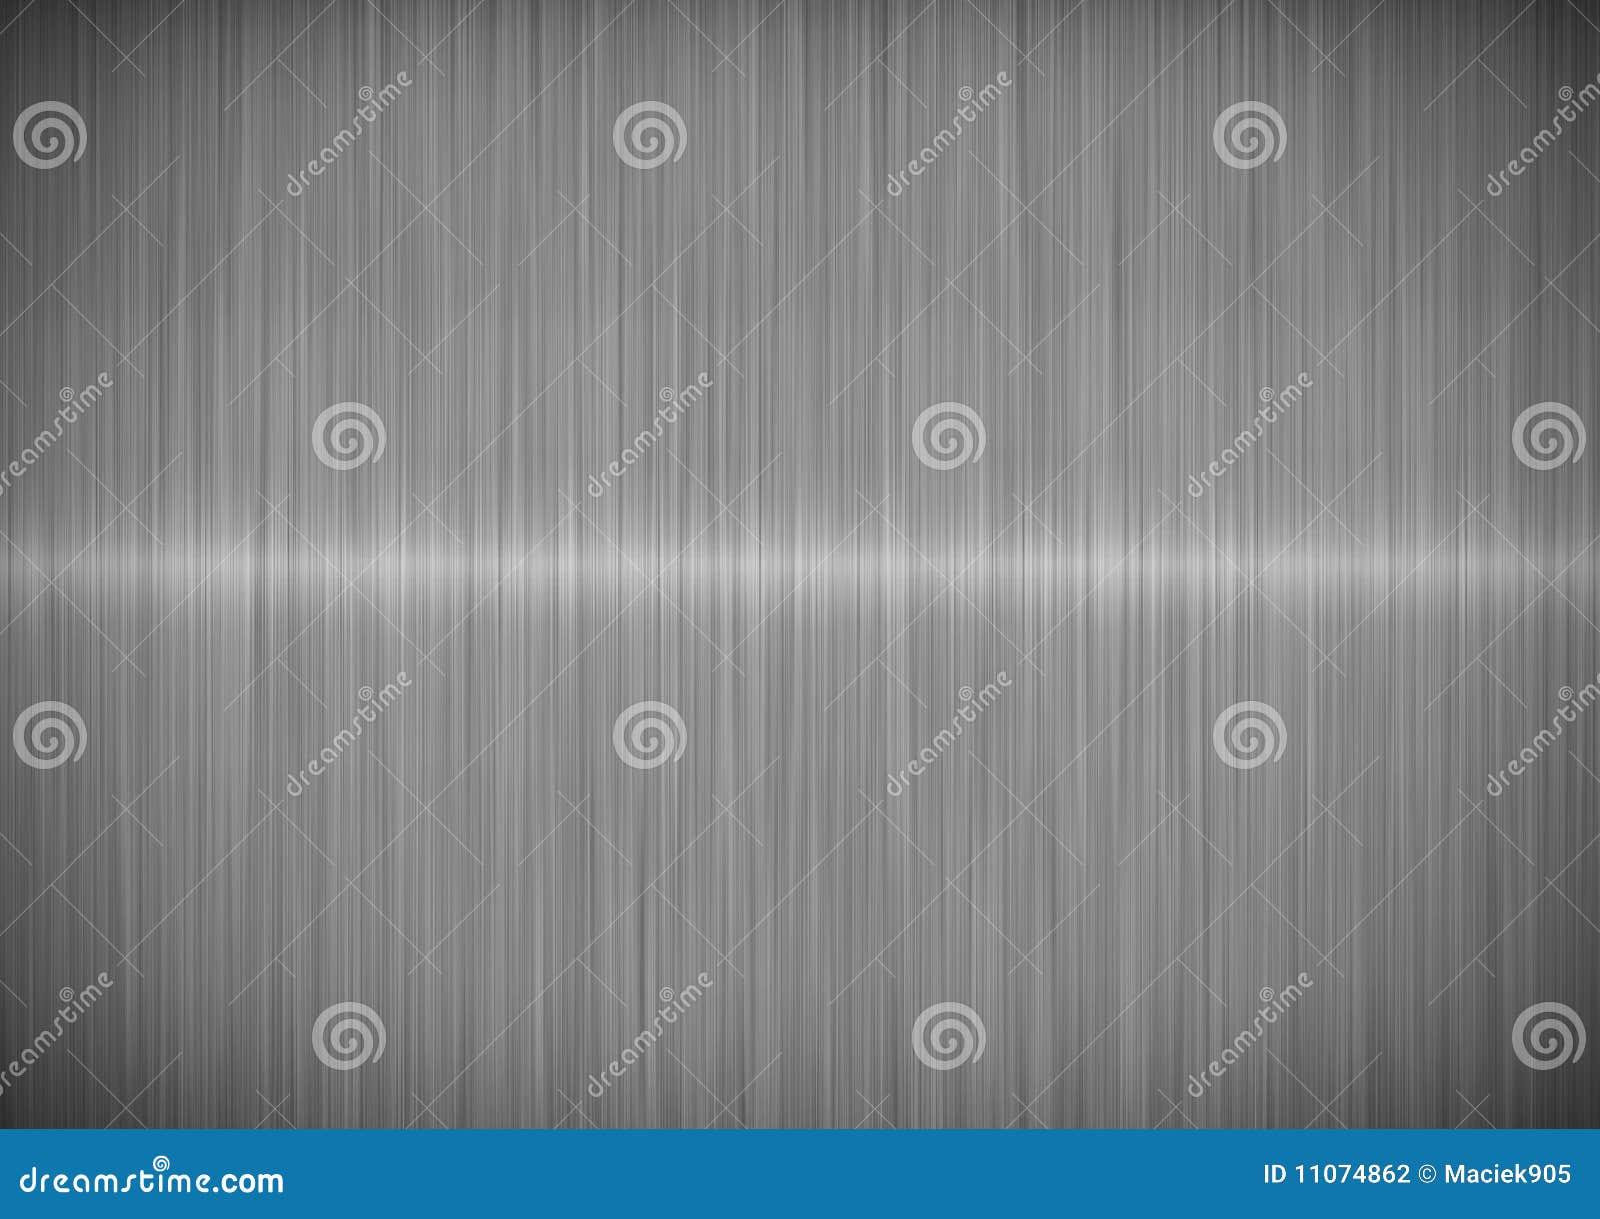 Silver metallic steel background